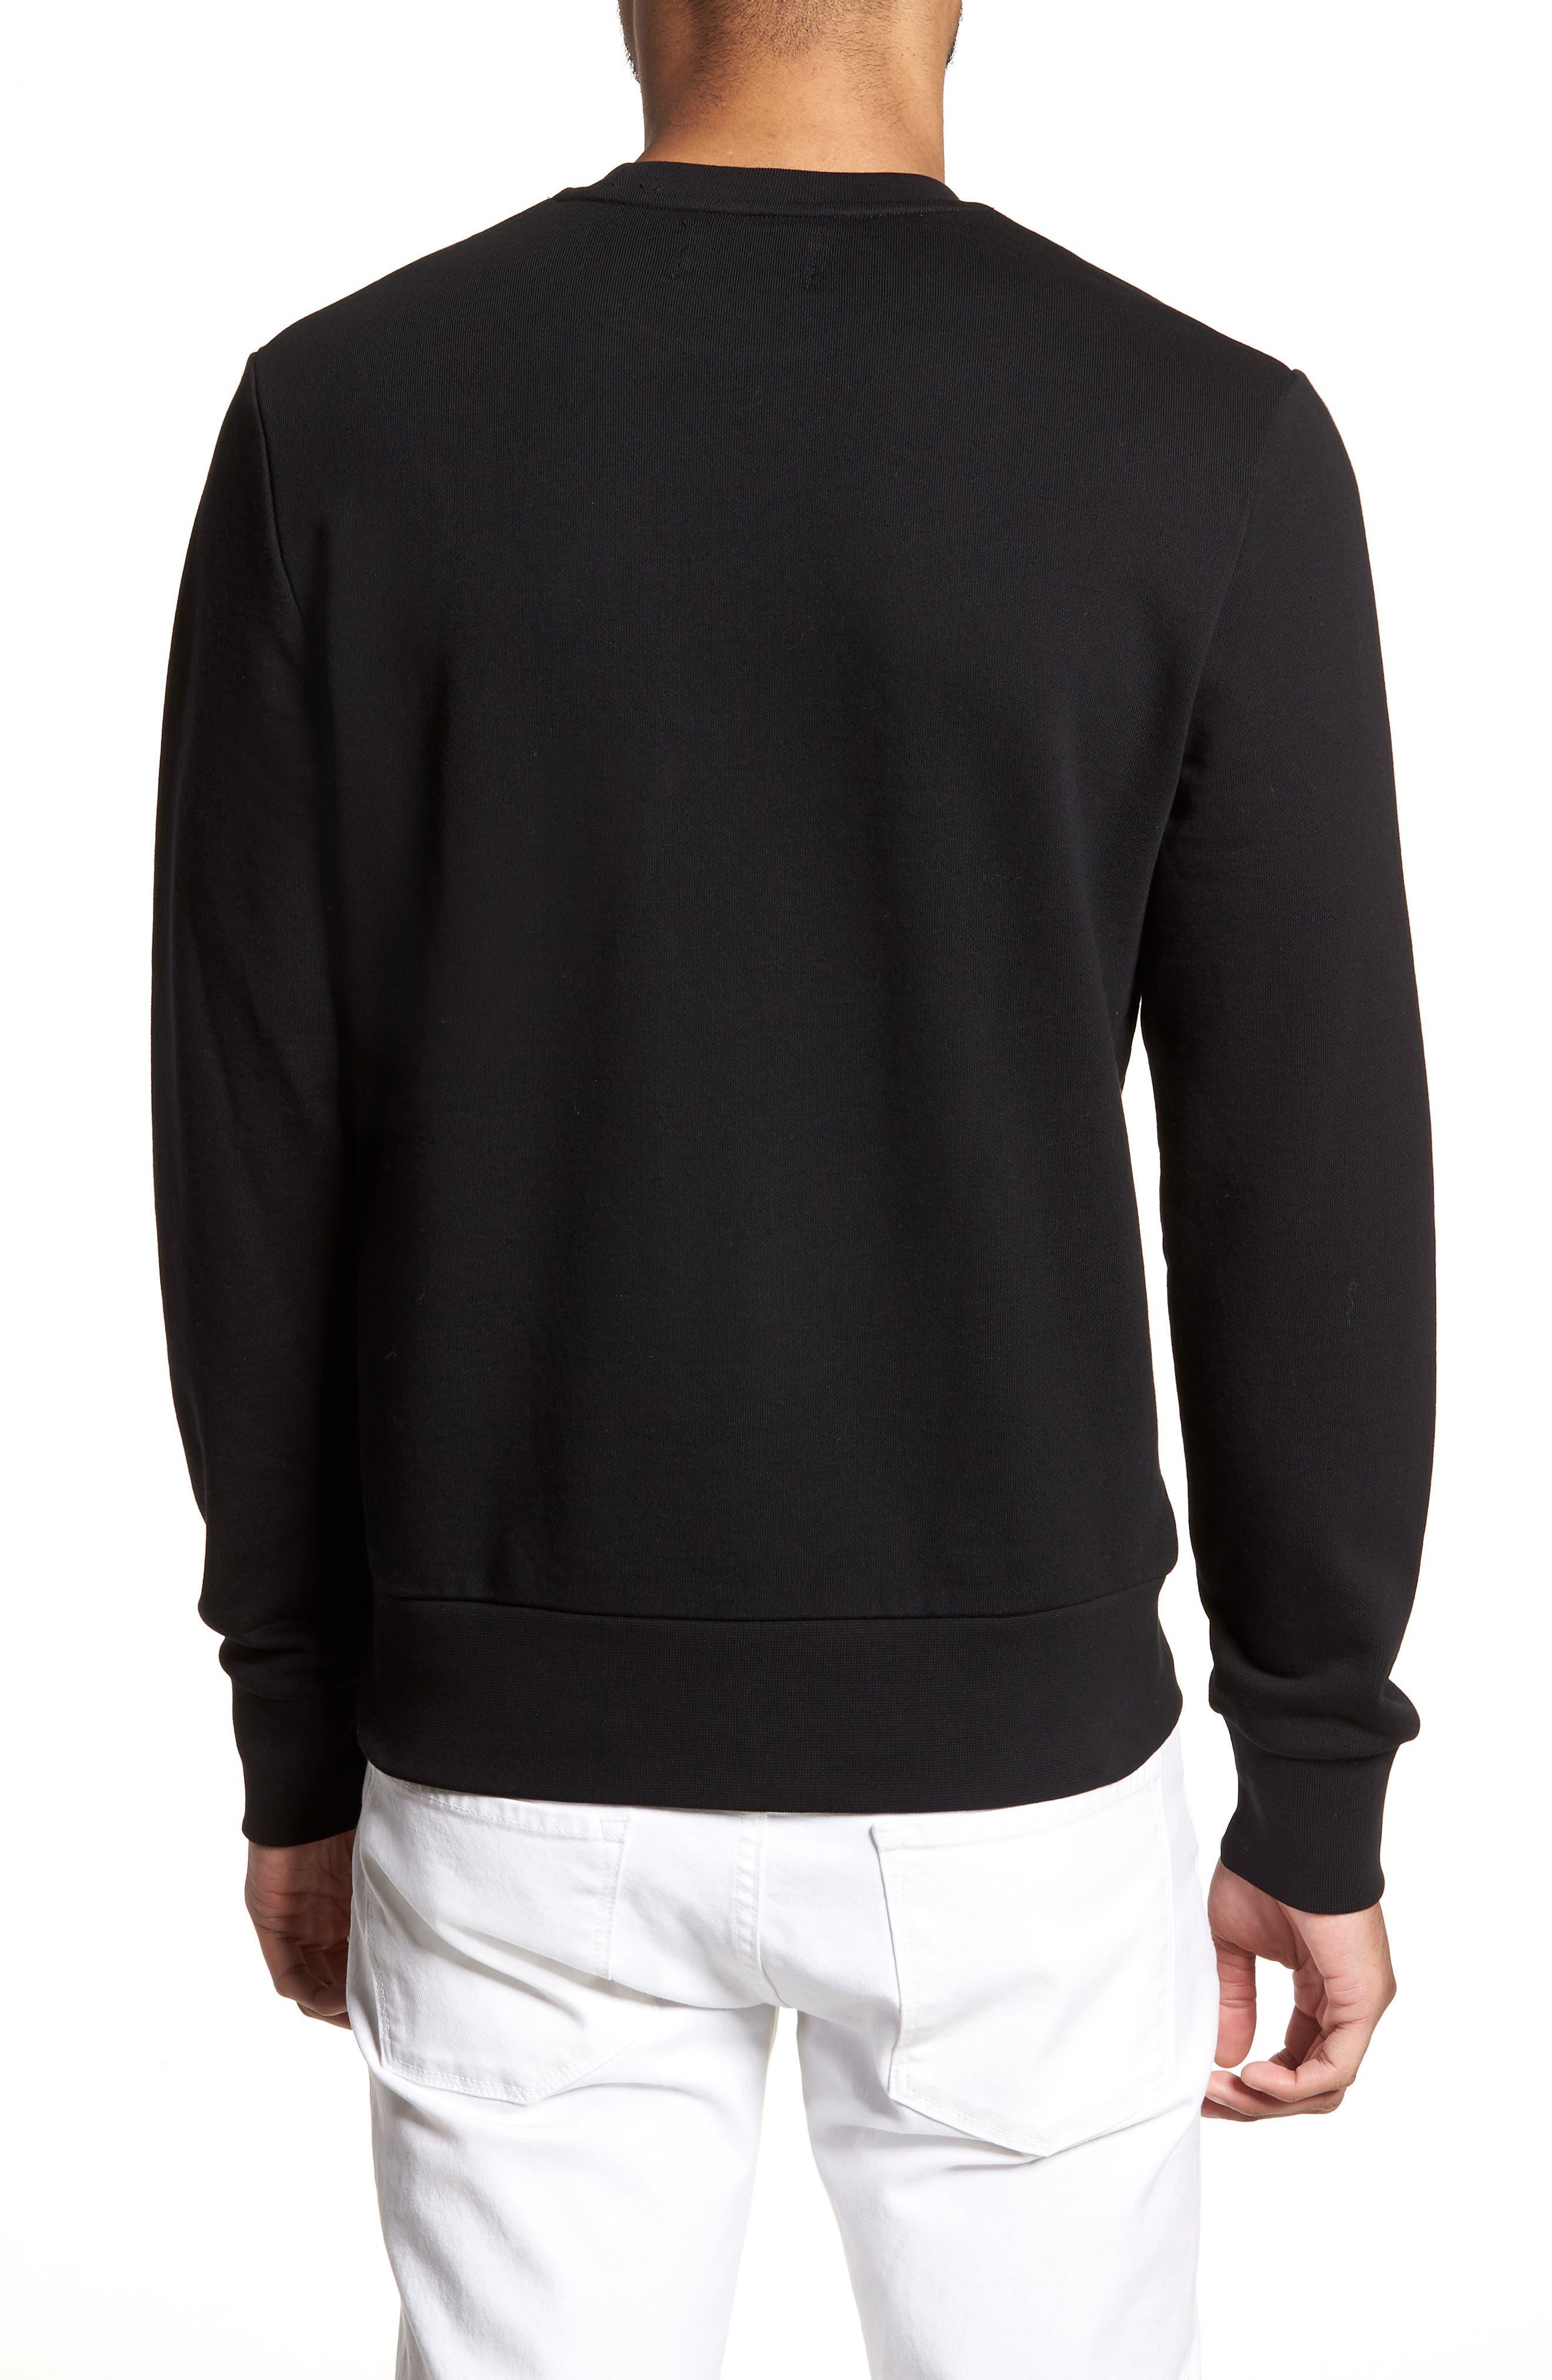 Embroidered Sweatshirt,                             Alternate thumbnail 2, color,                             001